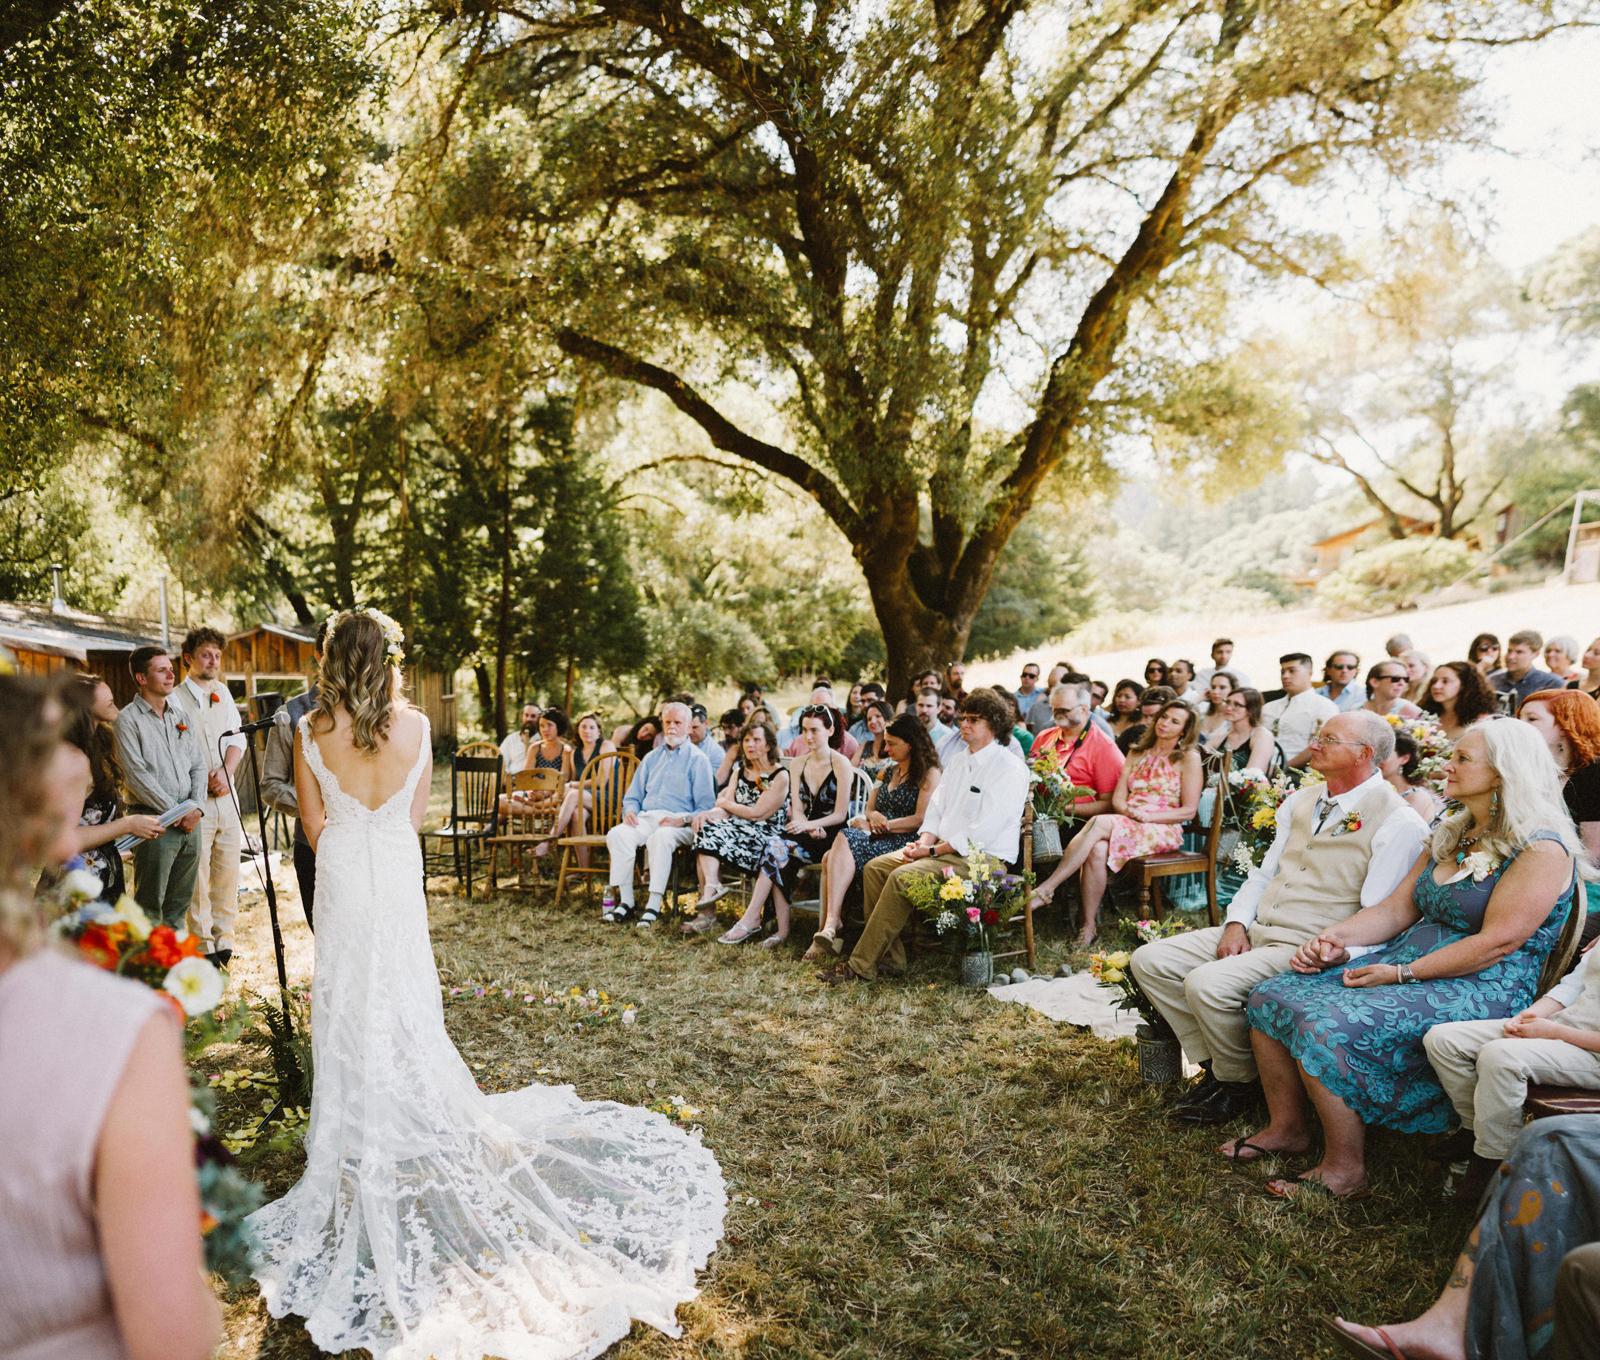 rivers-bend-retreat-wedding-032 RIVER'S BEND RETREAT WEDDING